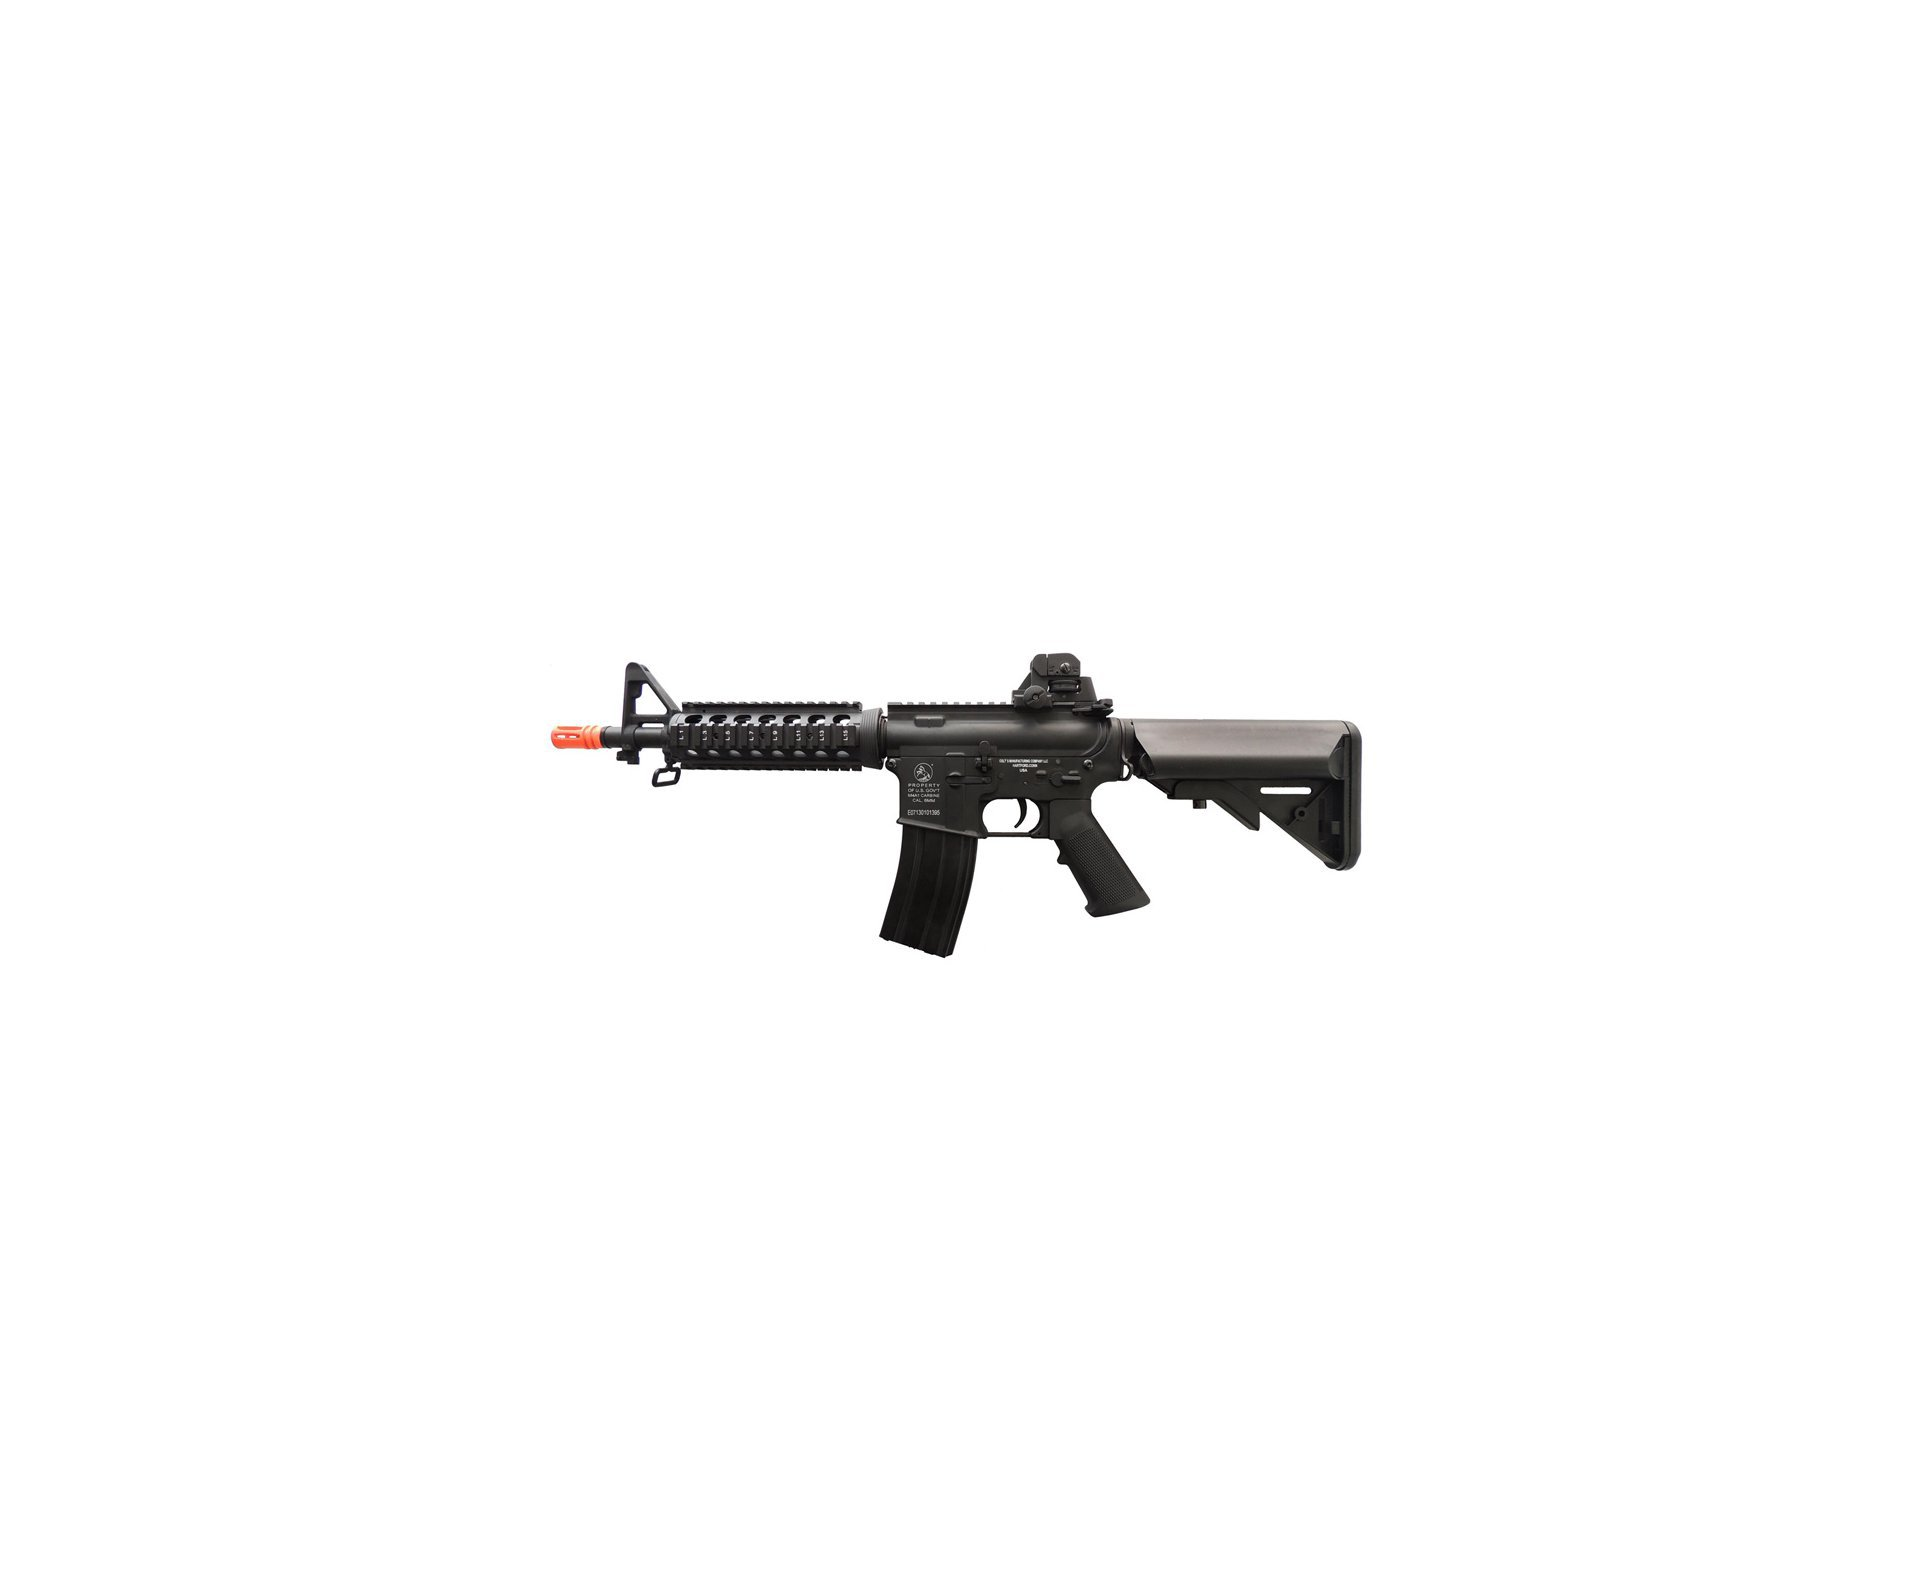 Rifle De Airsoft Colt M4 Ris Cqb - Full Metal - Calibre 6.0 Mm - Cyber Gun